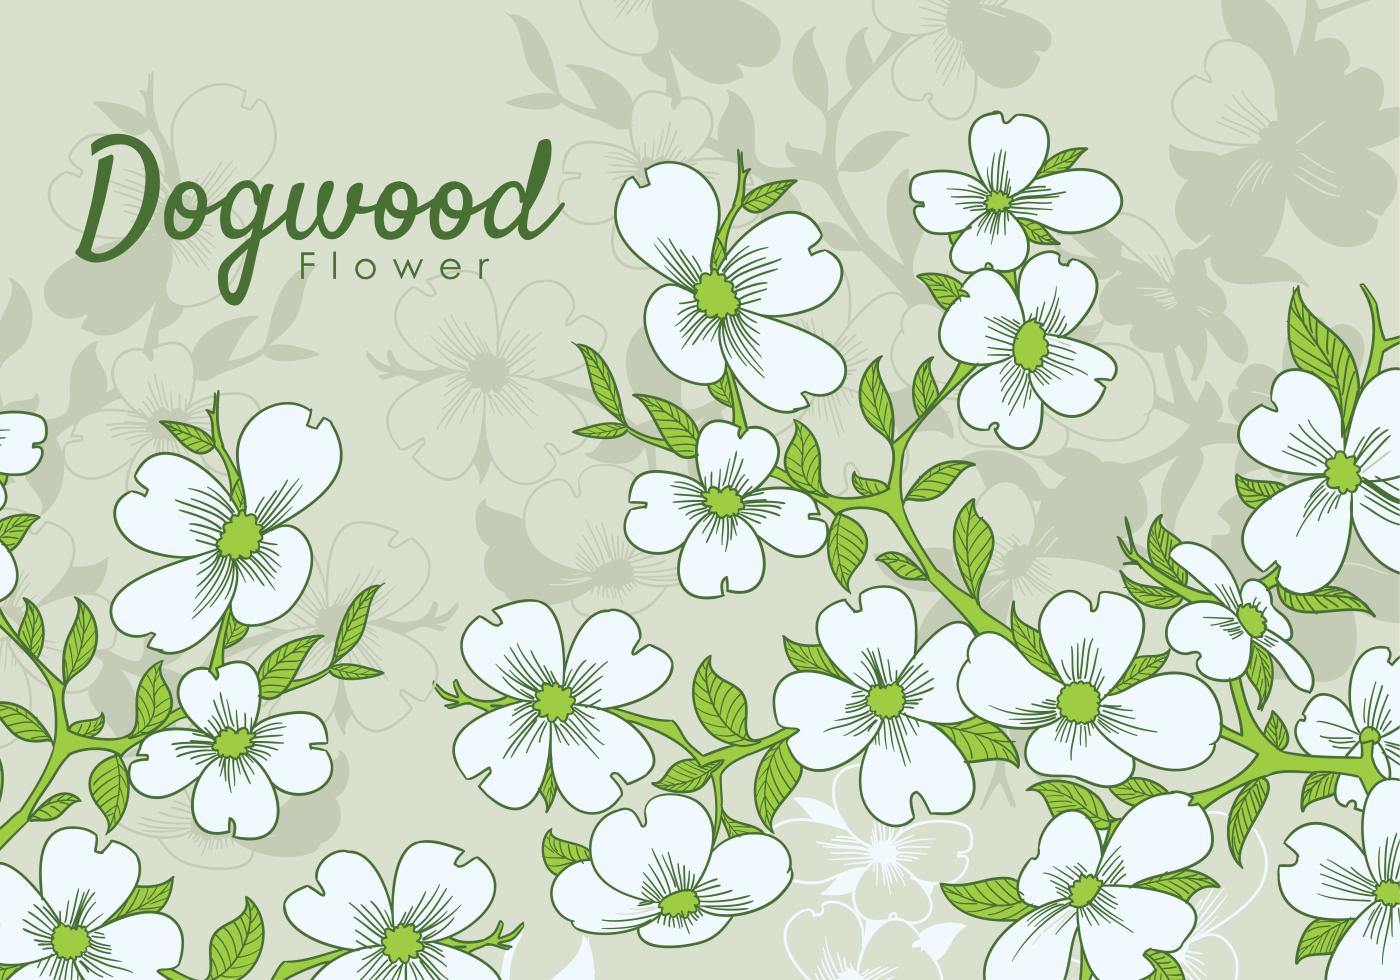 Free hand drawn dogwood flowers download free vector art stock free hand drawn dogwood flowers download free vector art stock graphics images izmirmasajfo